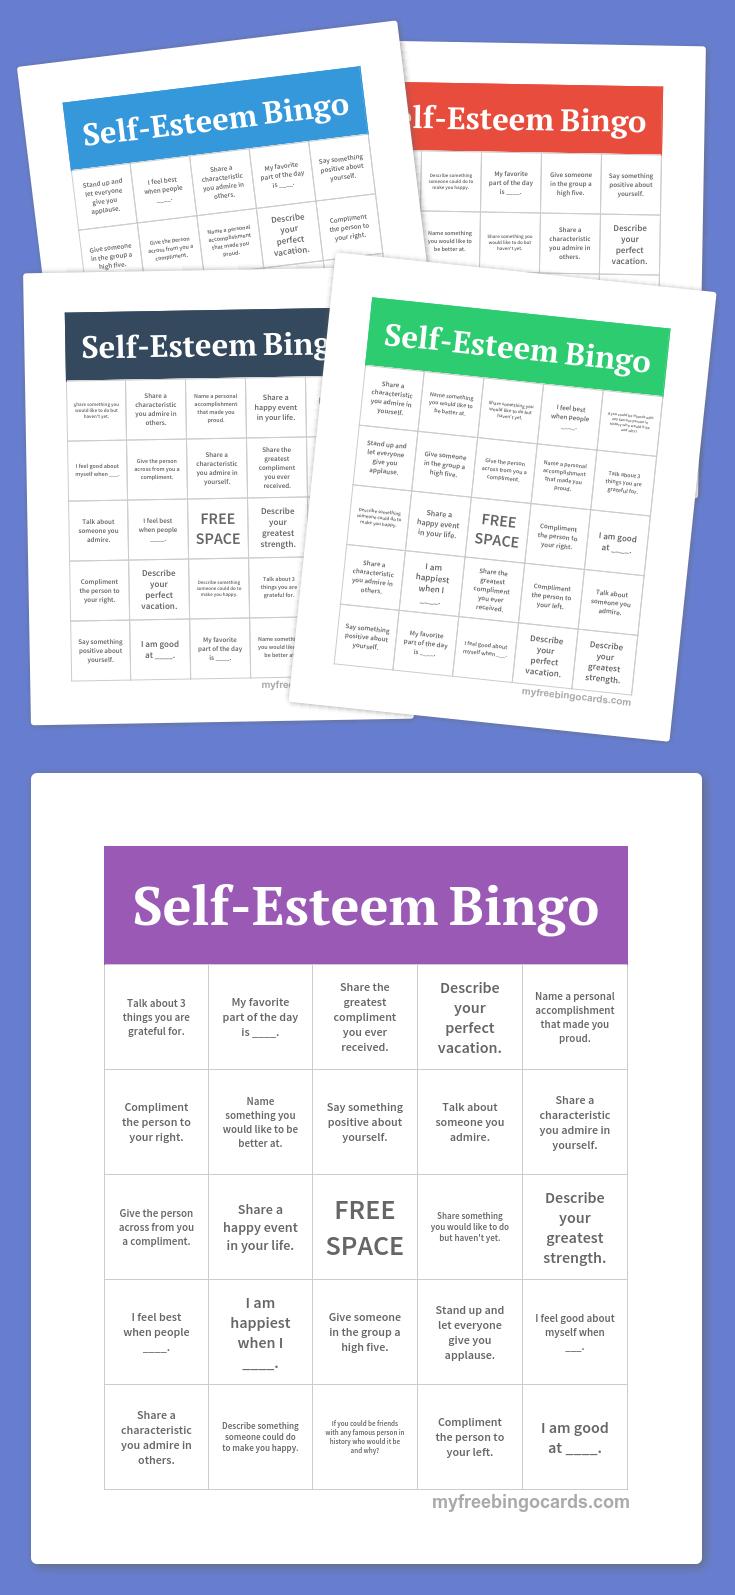 Self-Esteem Bingo | Bingo Cards Printable, Free Printable